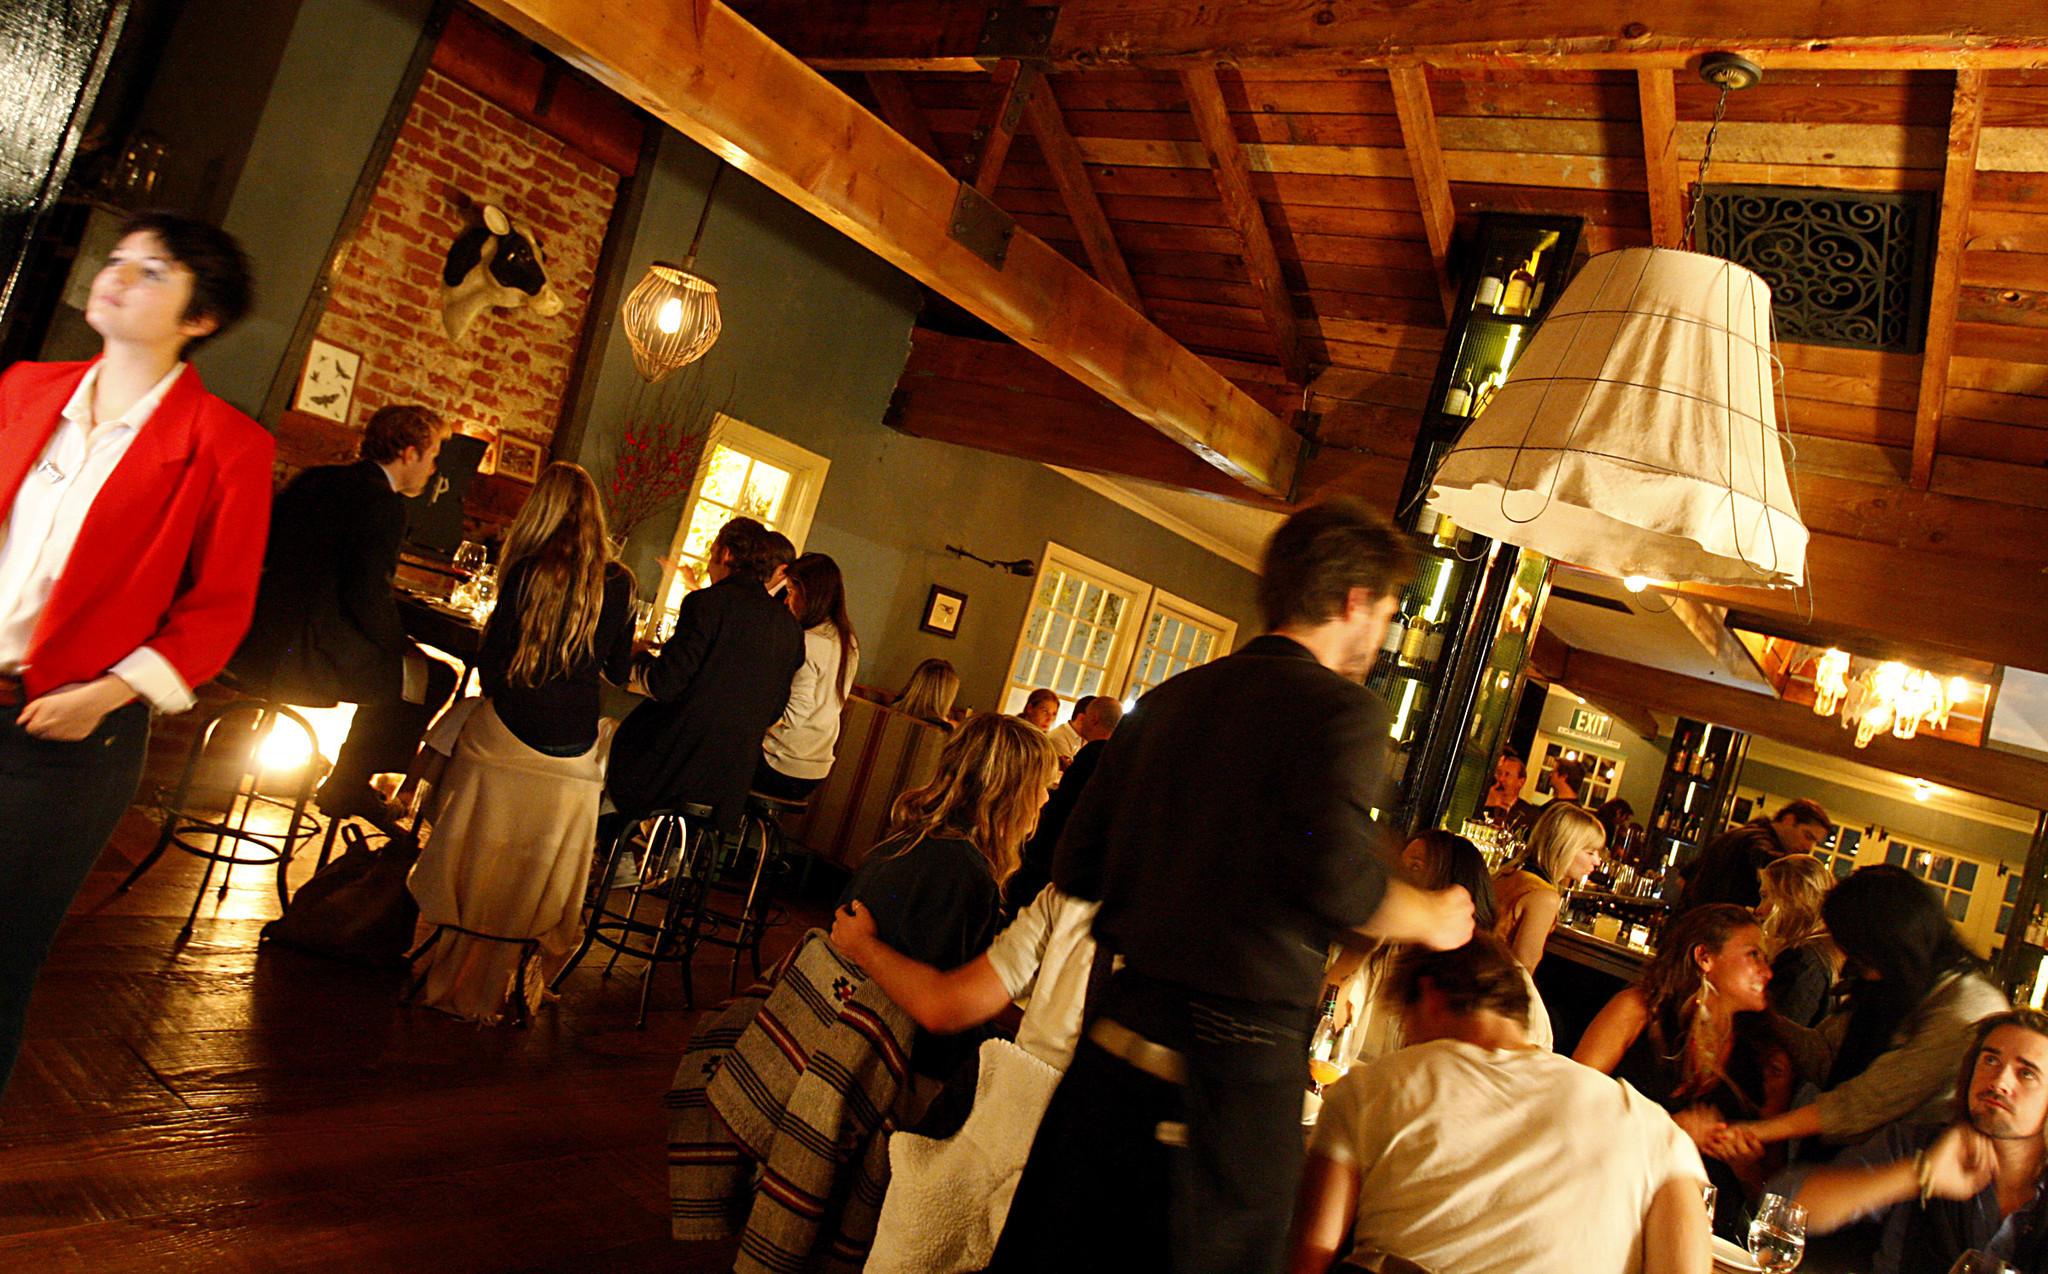 Restaurant design awards aia announces finalists